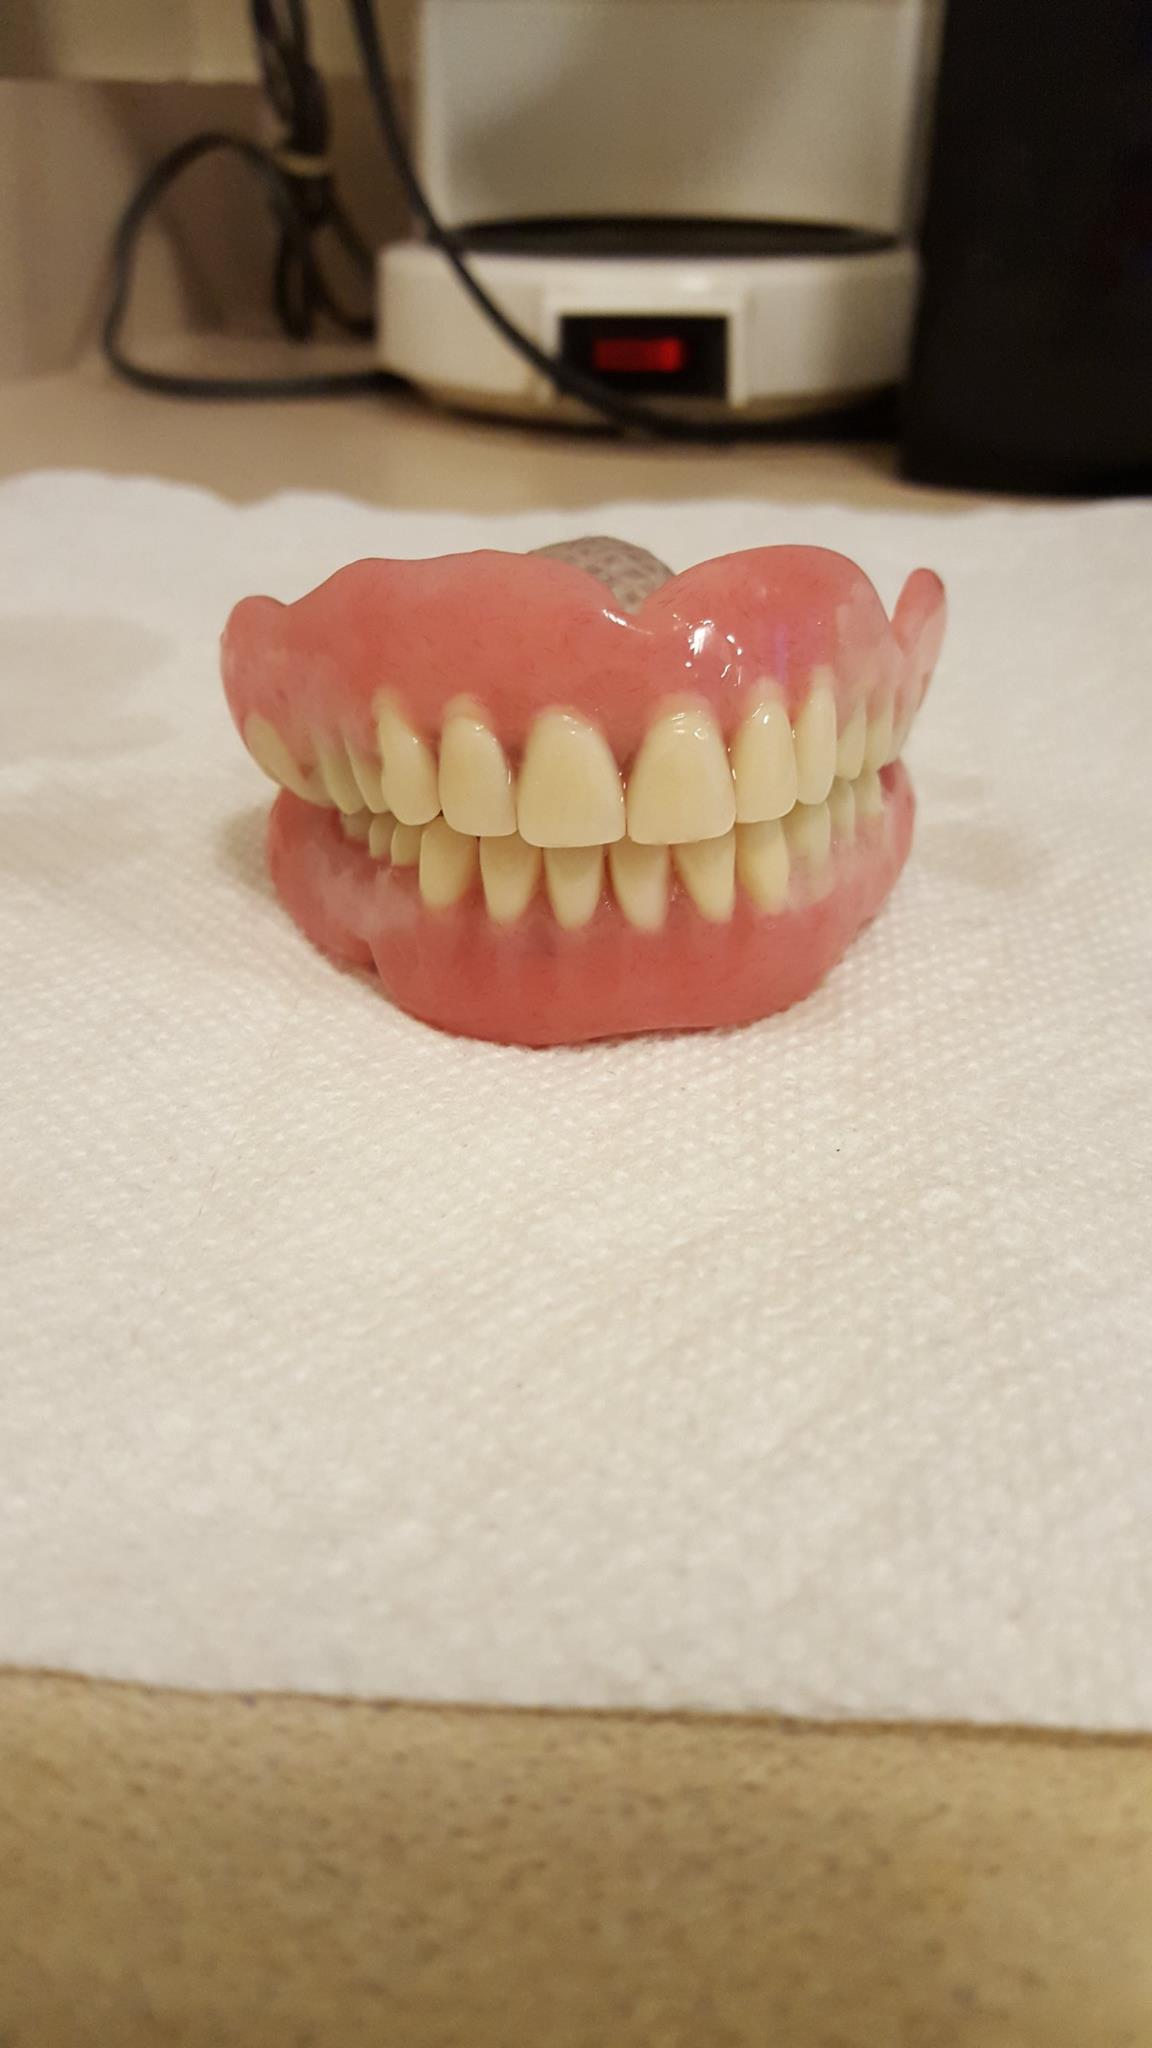 The Denture Set